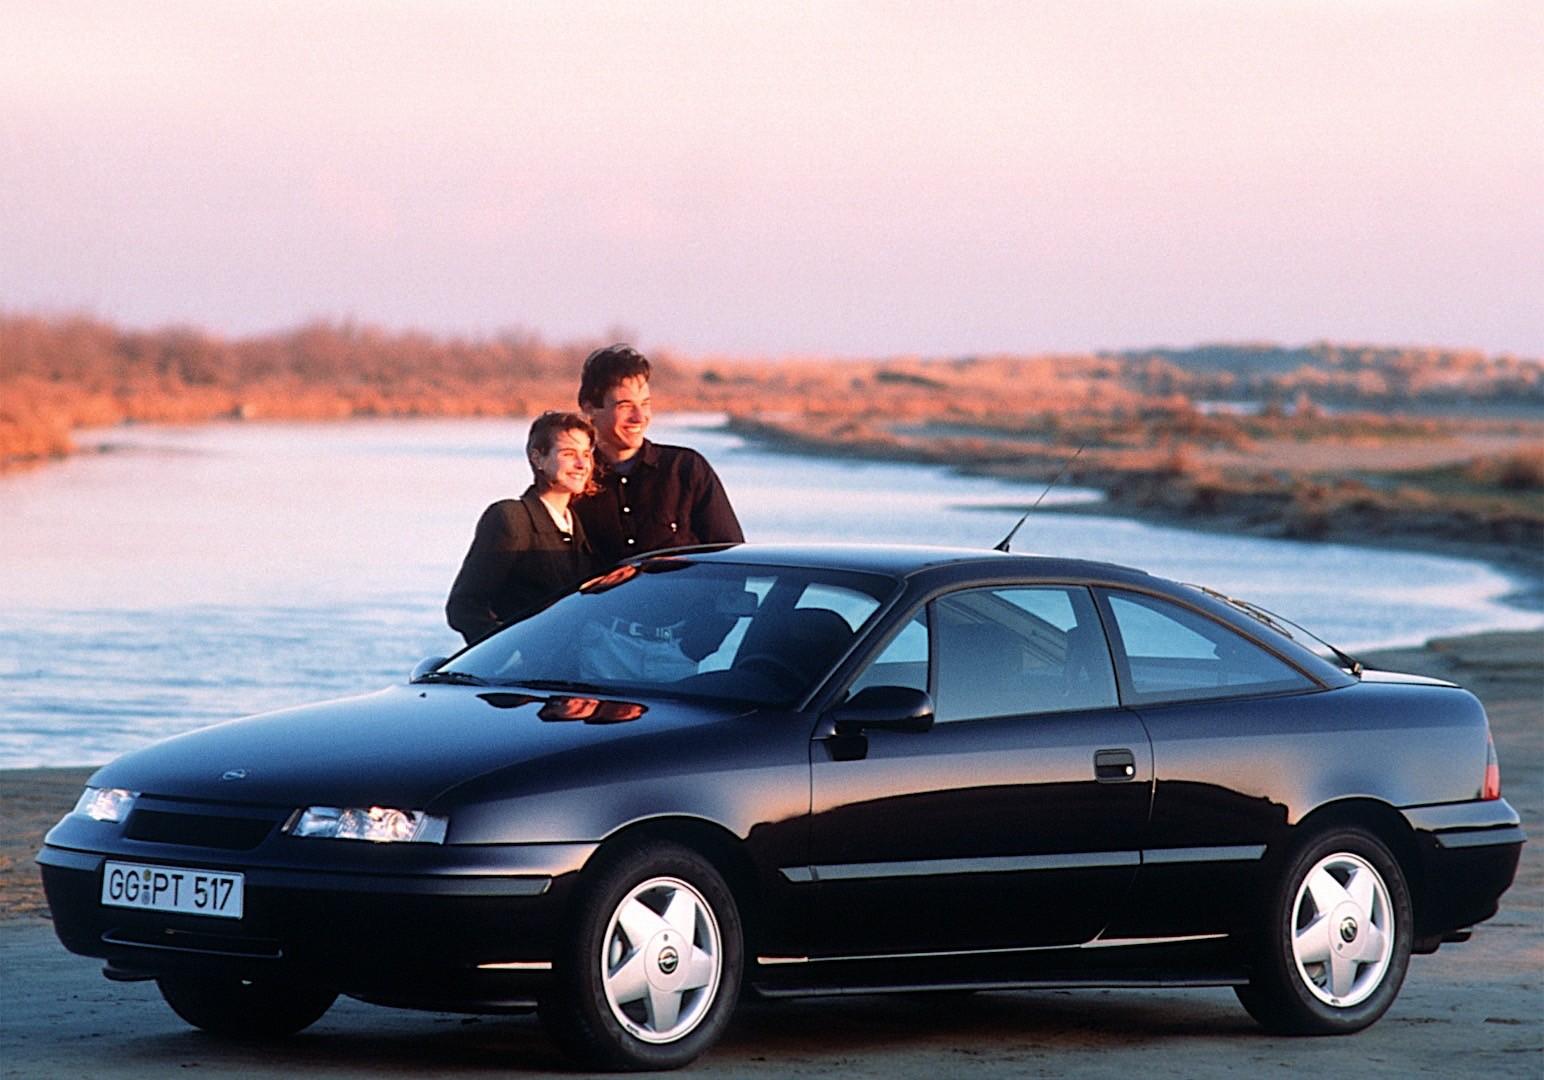 Opel Calibra 1989 - 1997 Coupe #5